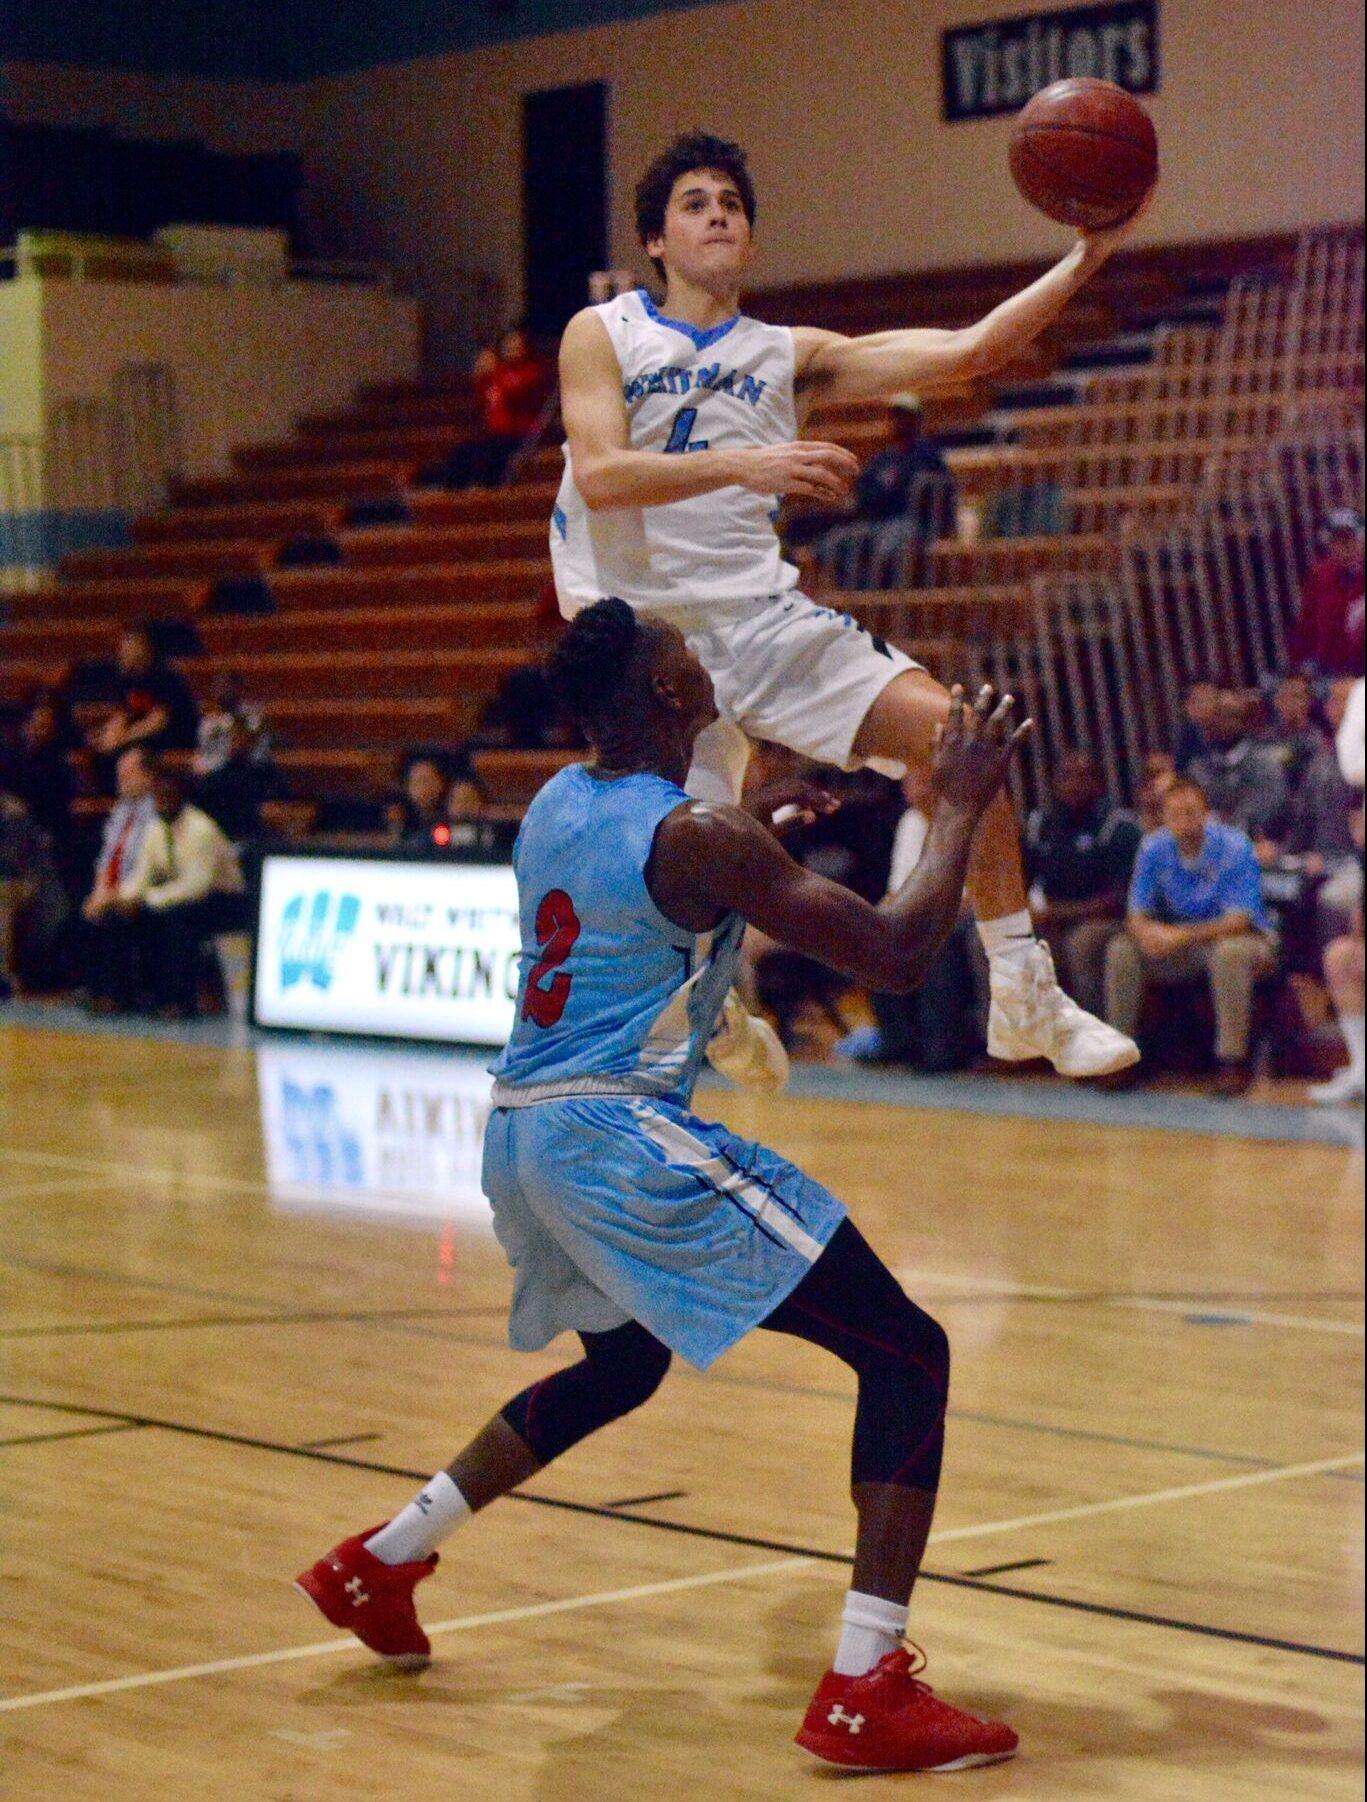 Guard Alex Sanson attacks the basket for a team-high 18 points in a tight contest against Einstein. Photo by Lauren Oppenheim.